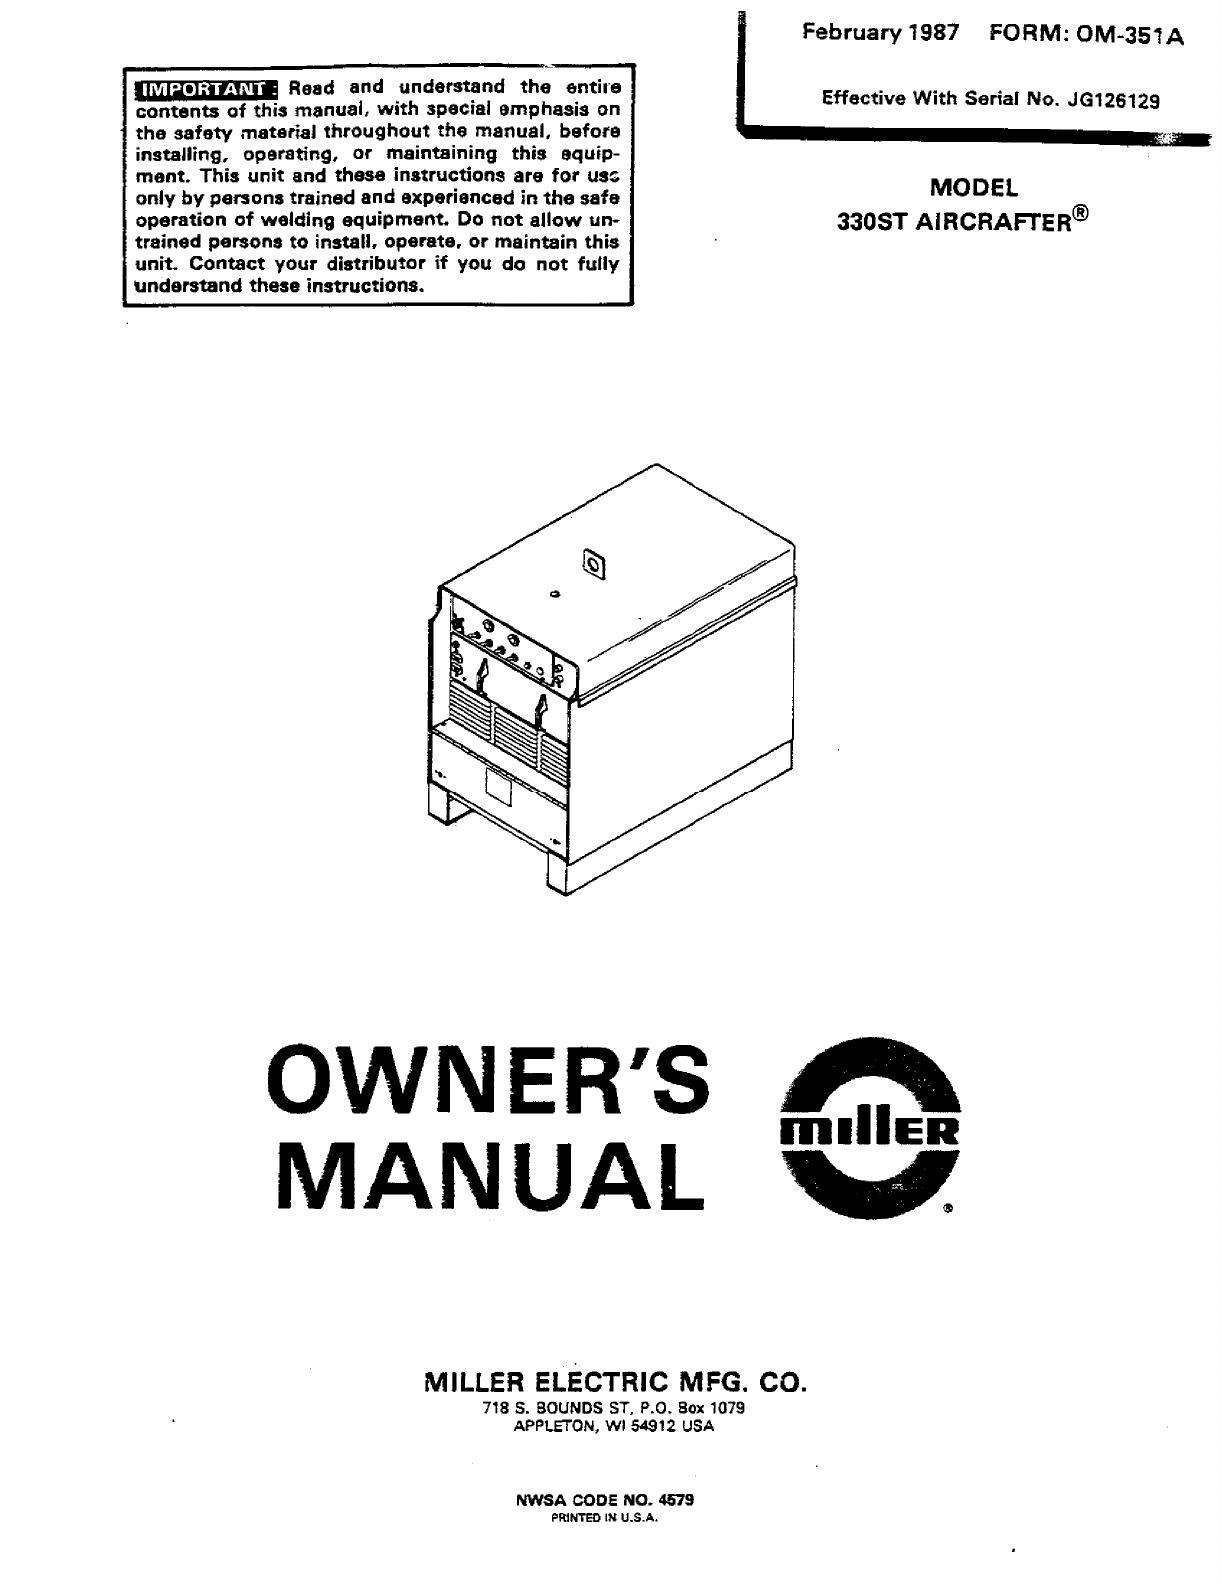 Miller Aircrafter 330ST Manual